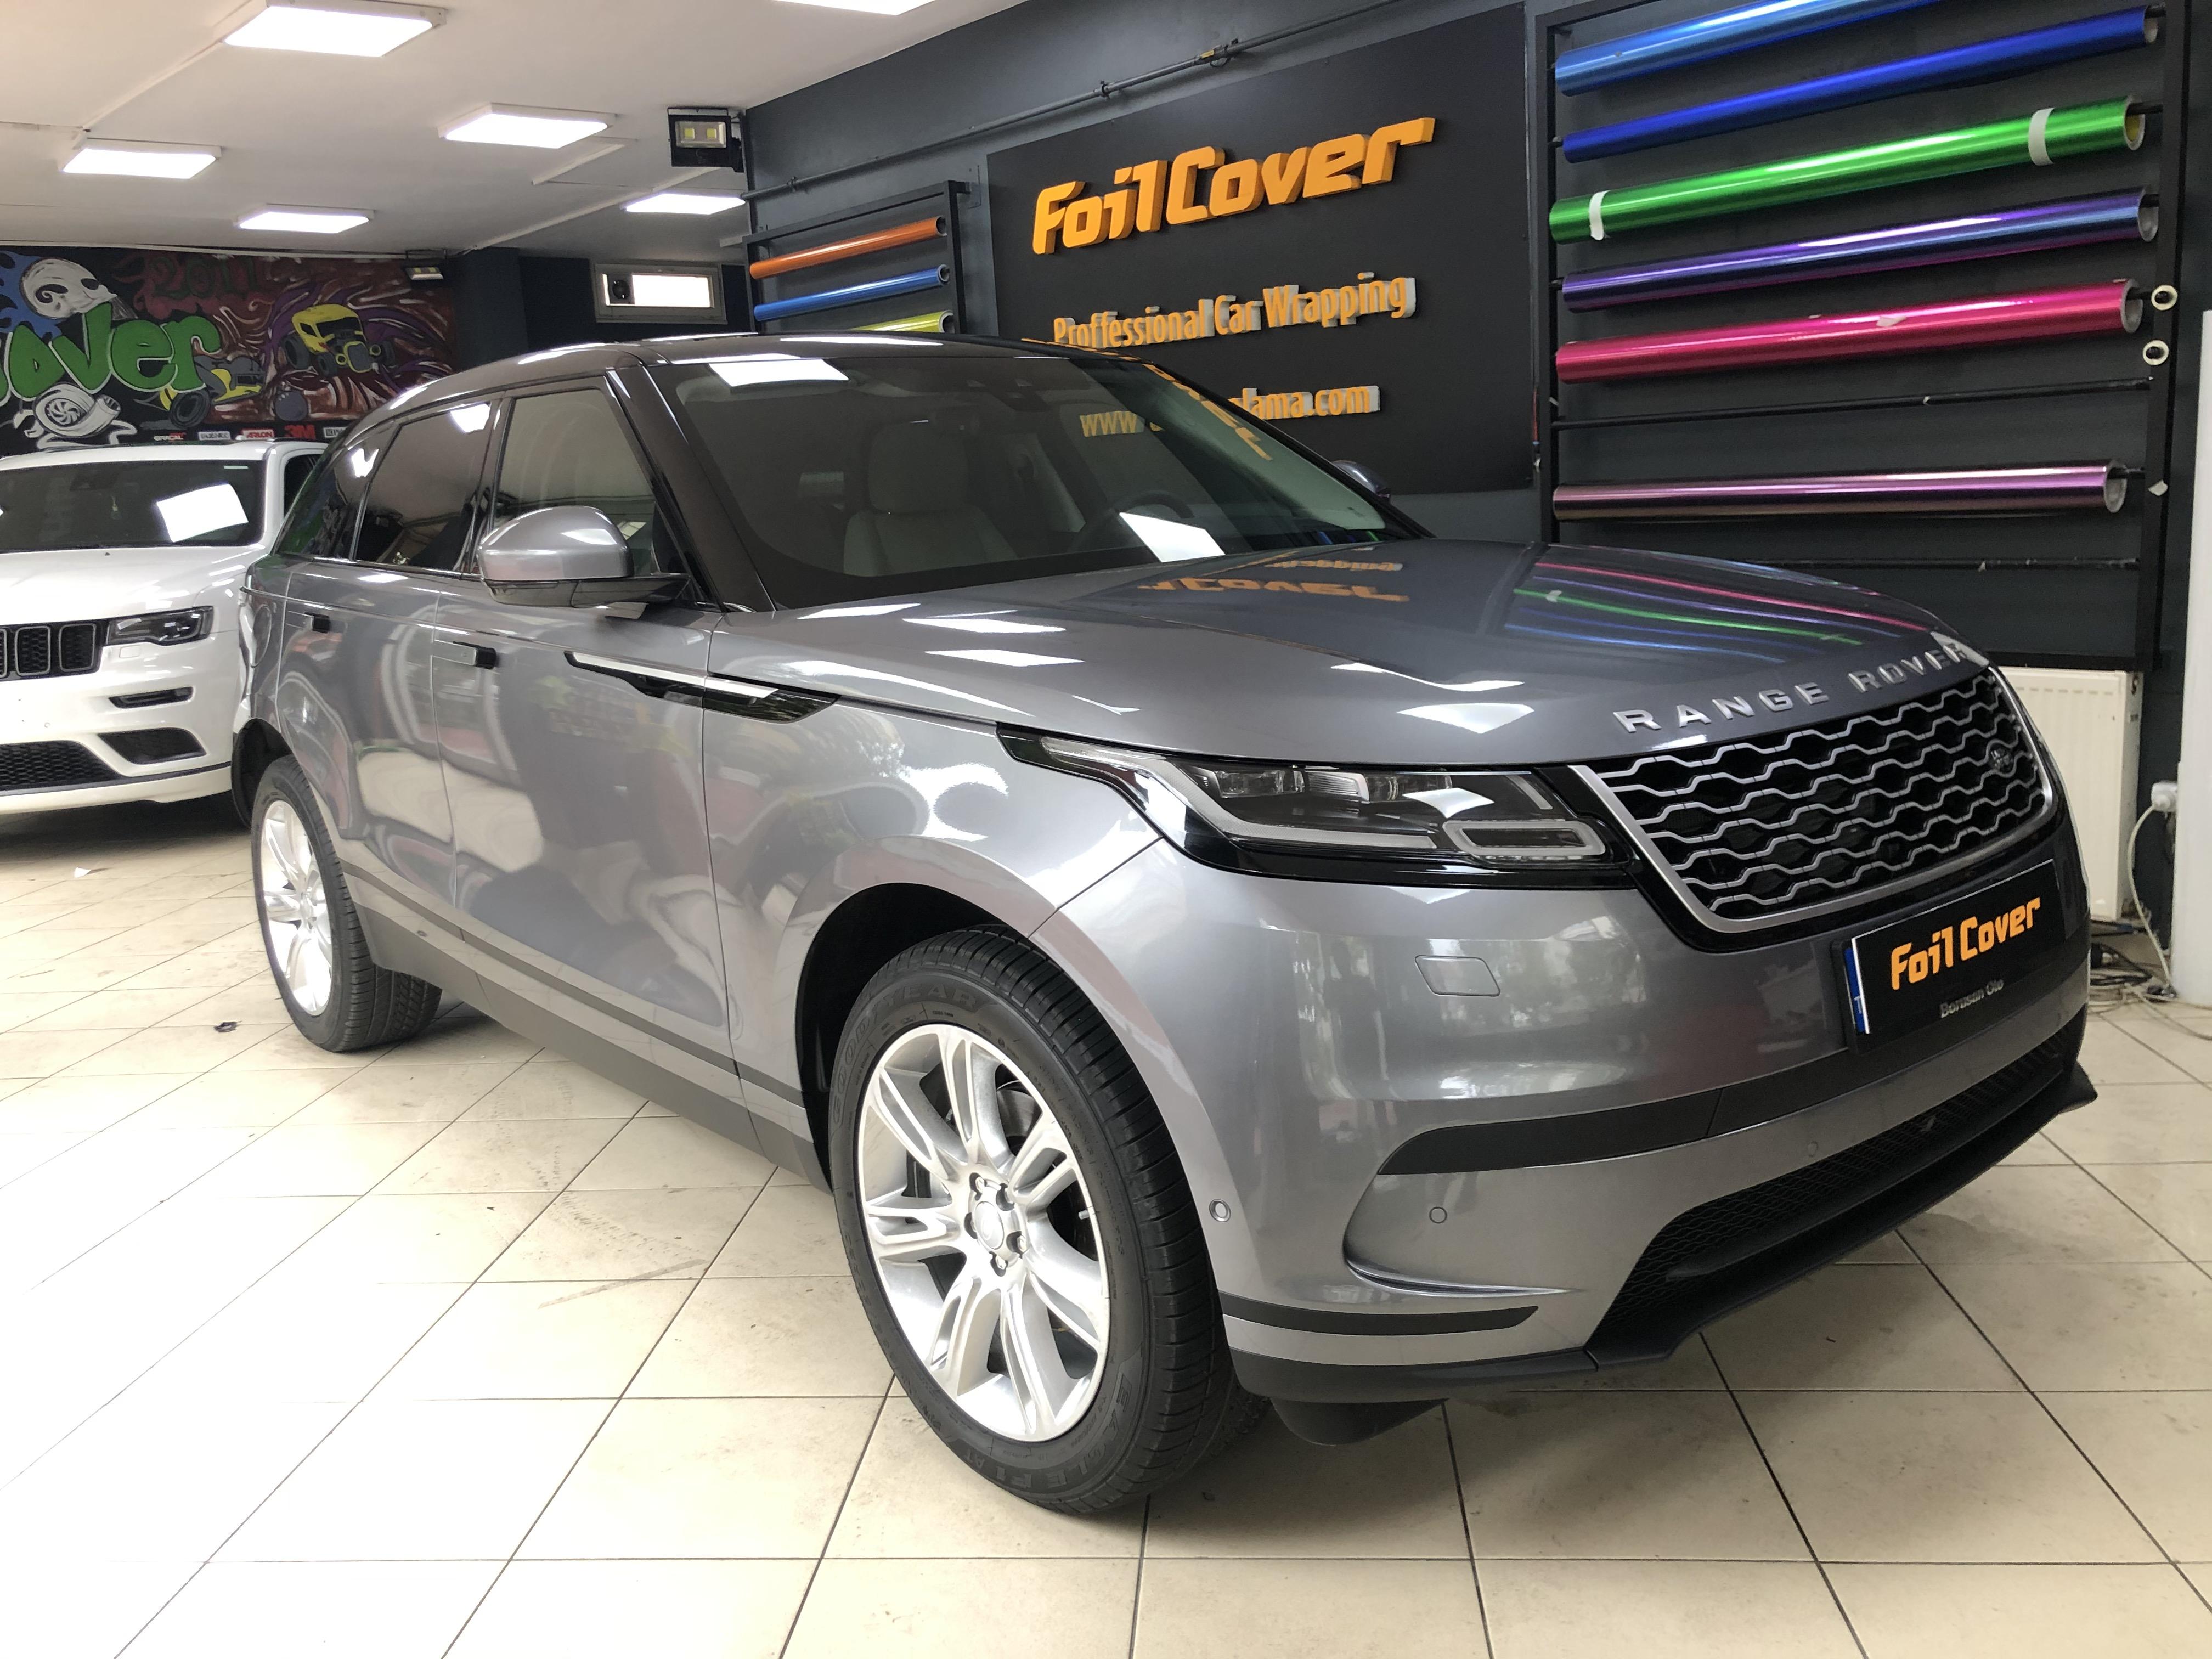 range rover boya koruma filmi kaplama araç kaplama fiyatları 2019 foil cover araç kaplama